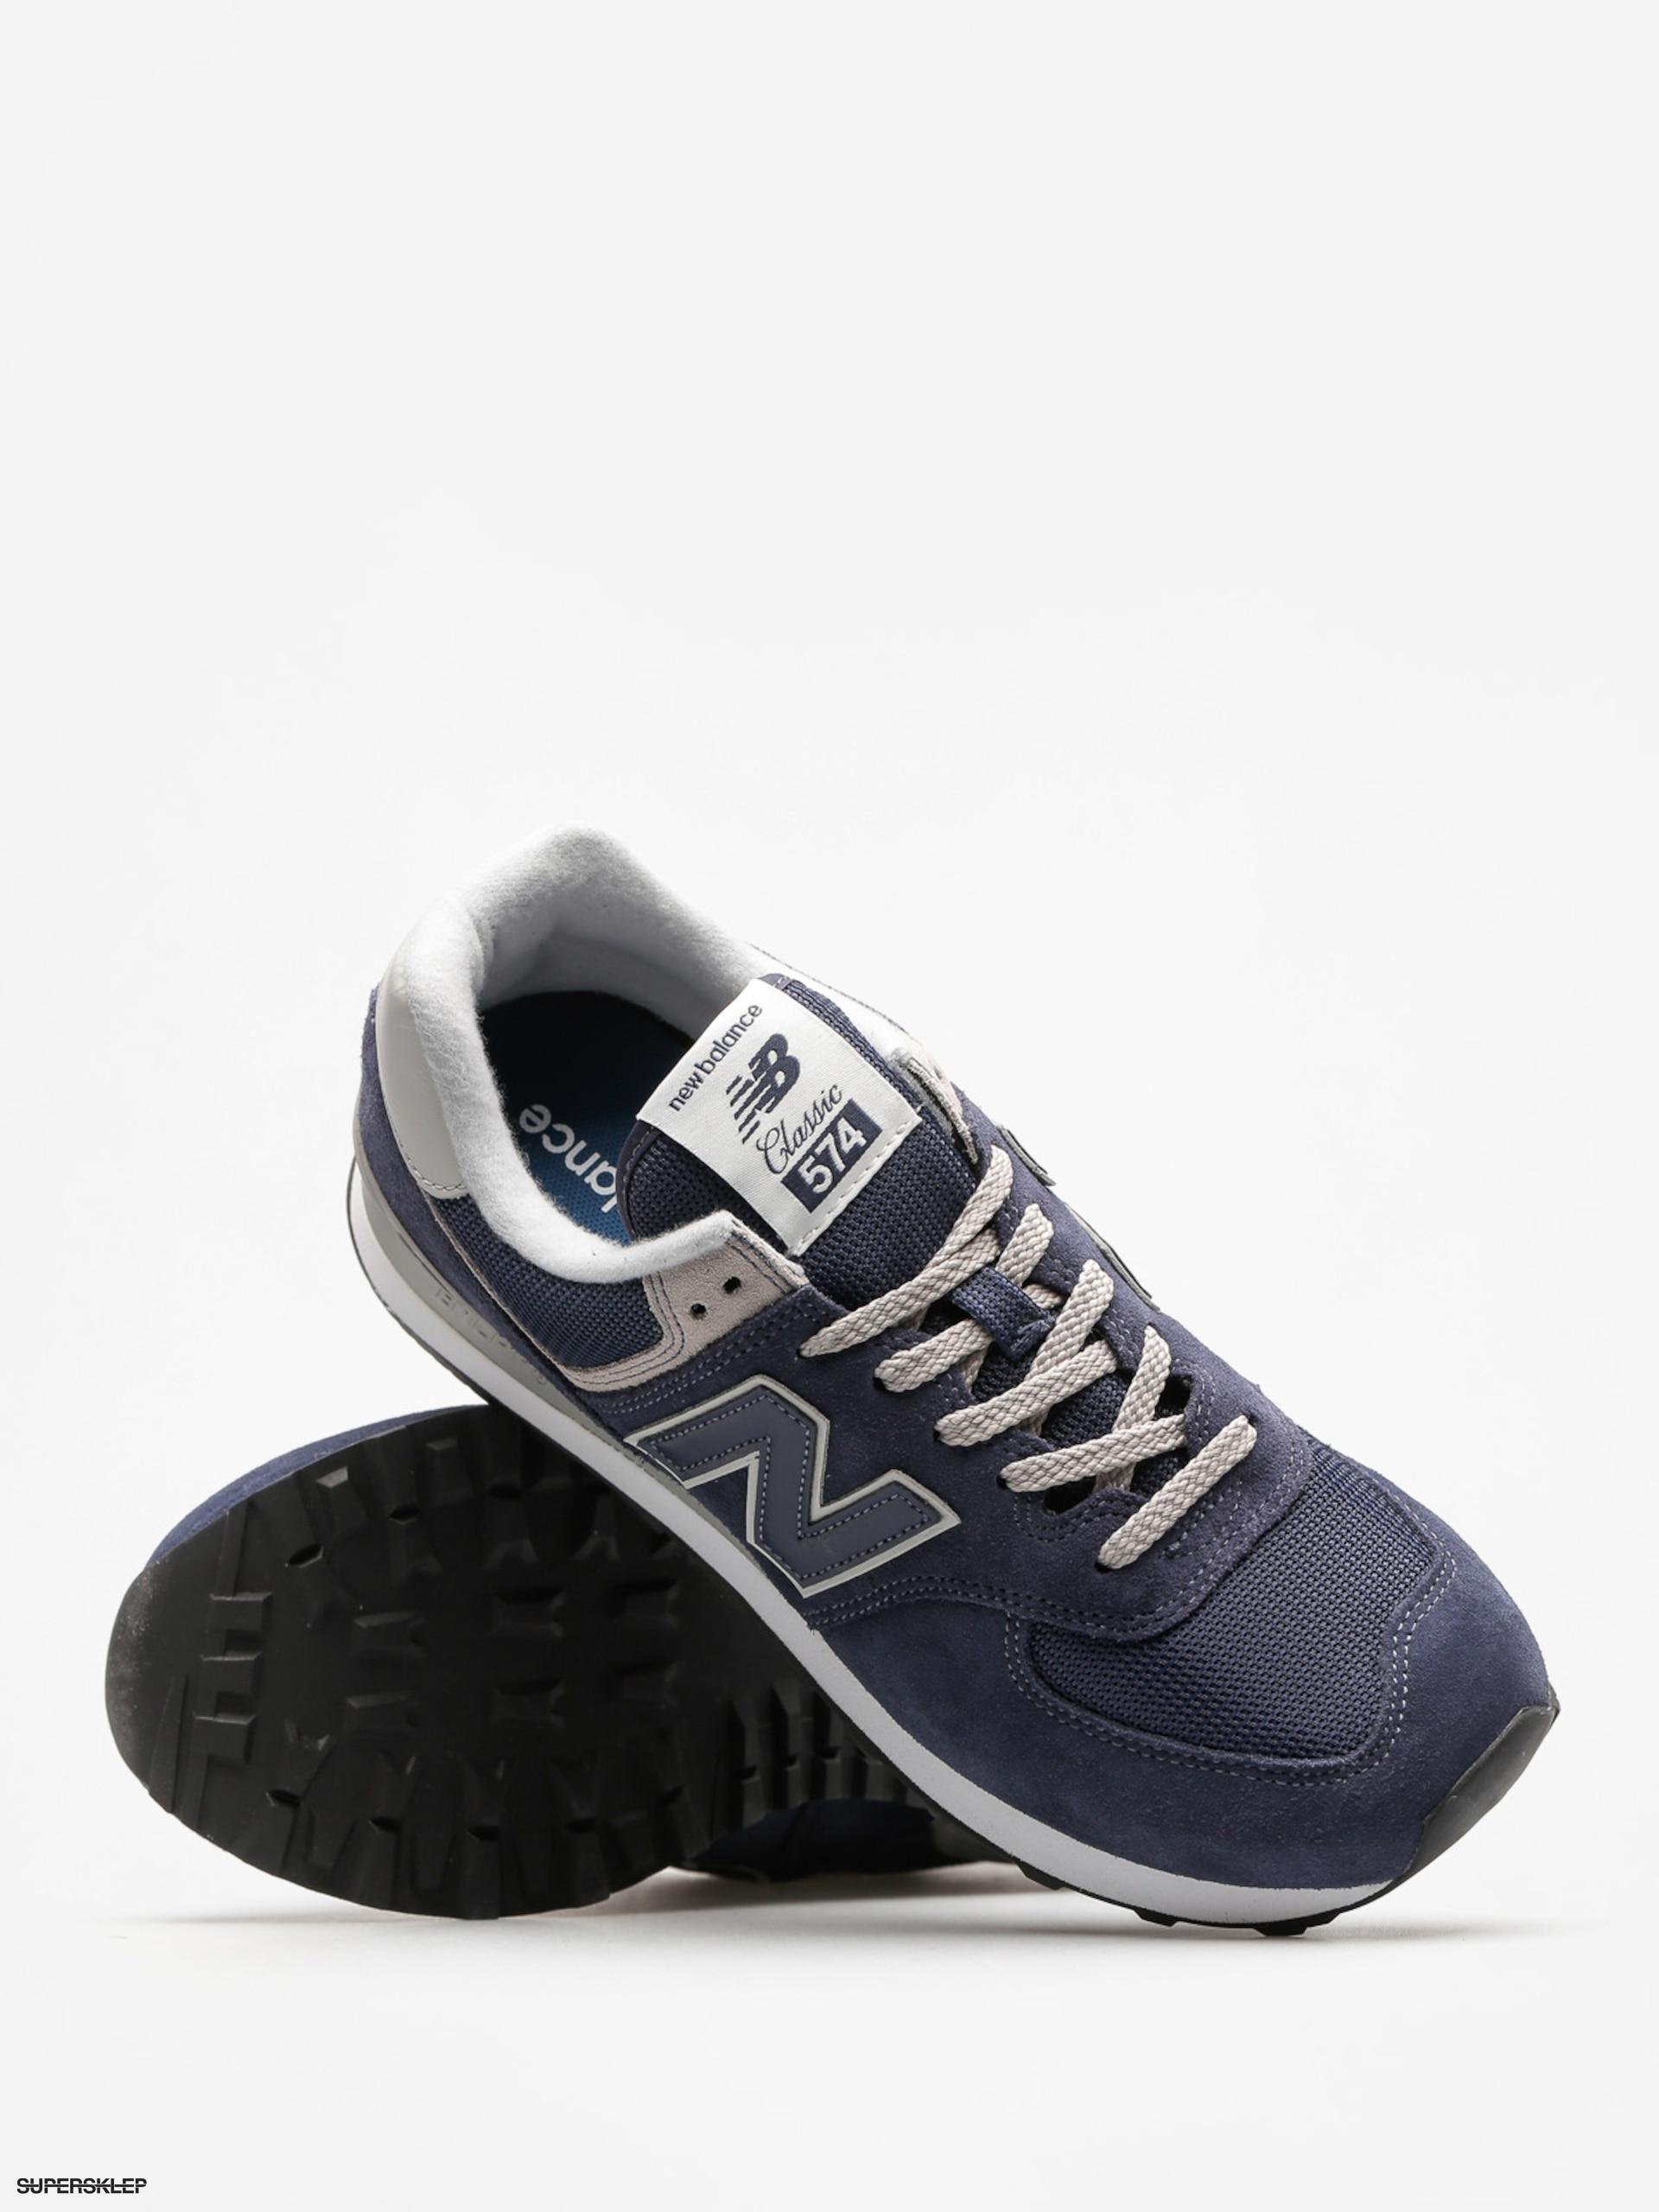 hot sale online f9737 93445 Buty New Balance 574 (black/iris)